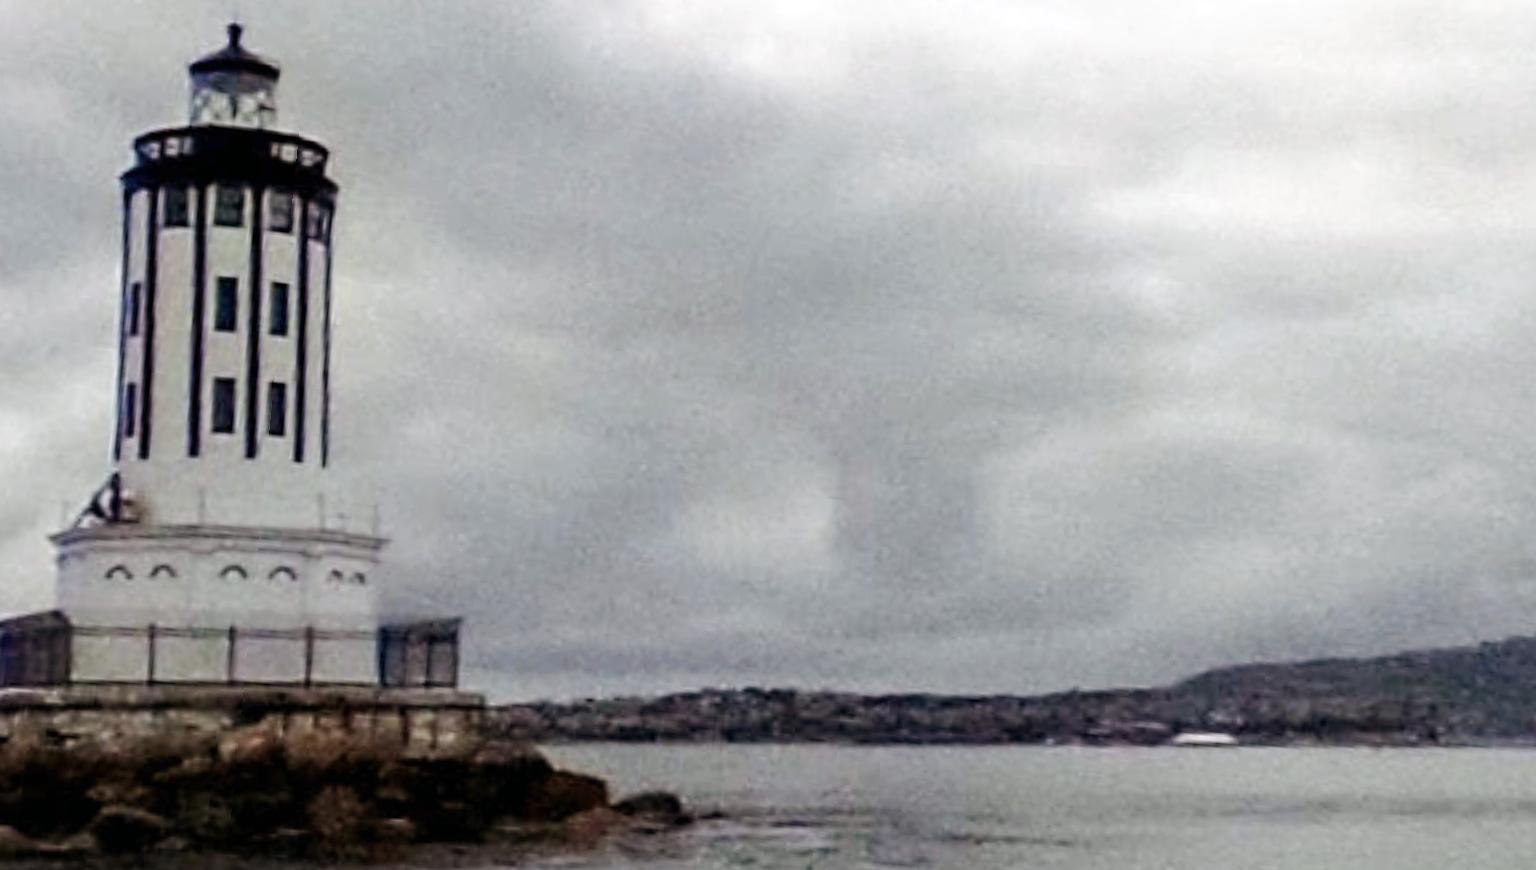 10 - killer 3 harbor lighthouse now.png